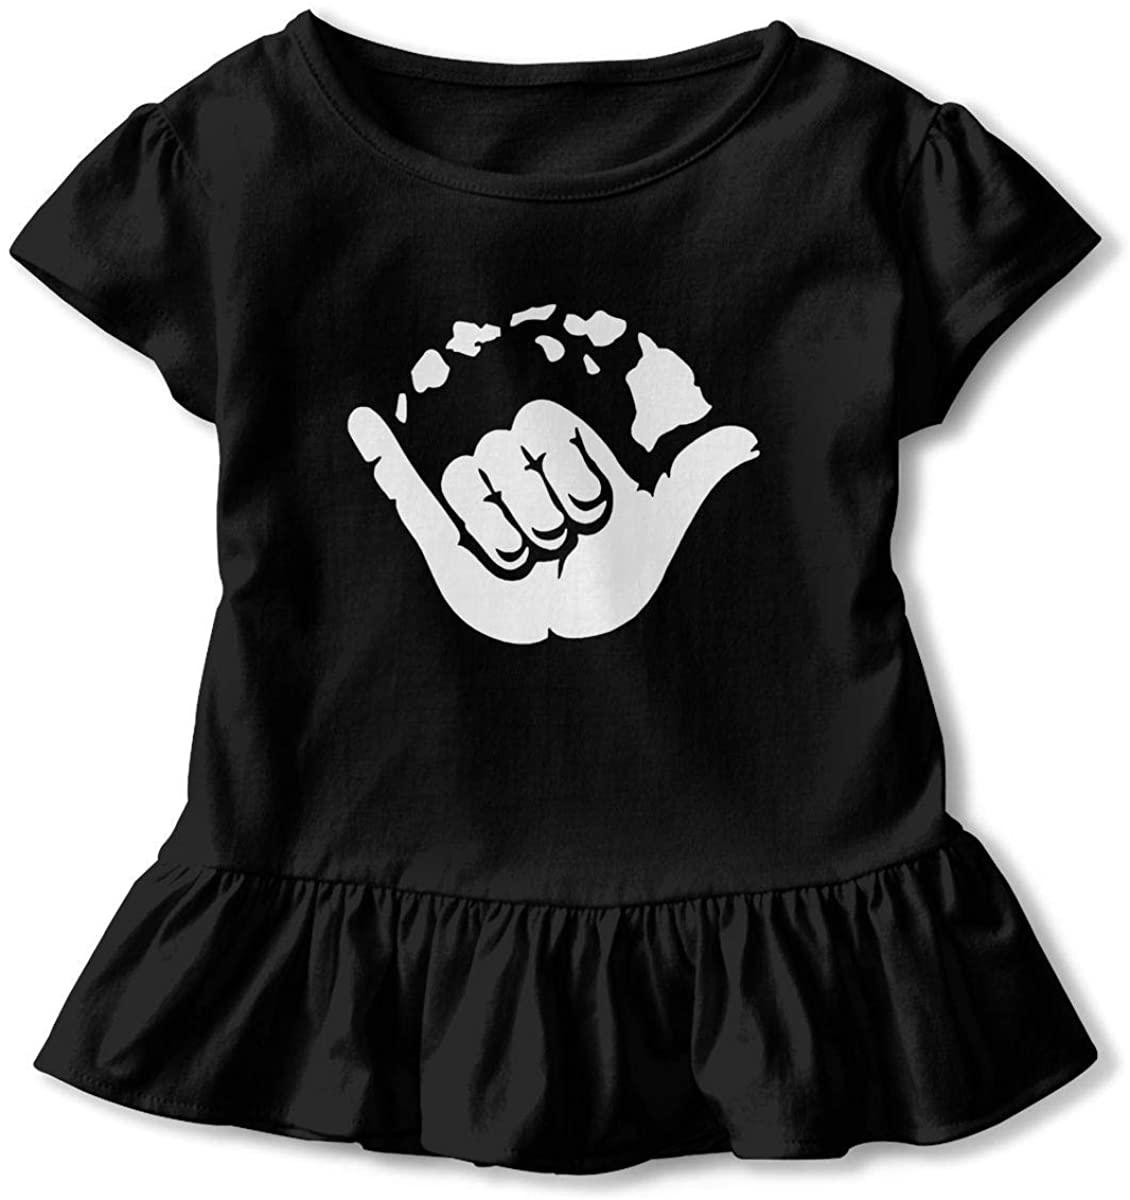 Aloha Hand Hawaii Symbol 3D Tee Baseball Ruffle Short Sleeve Cotton Girls Shirts